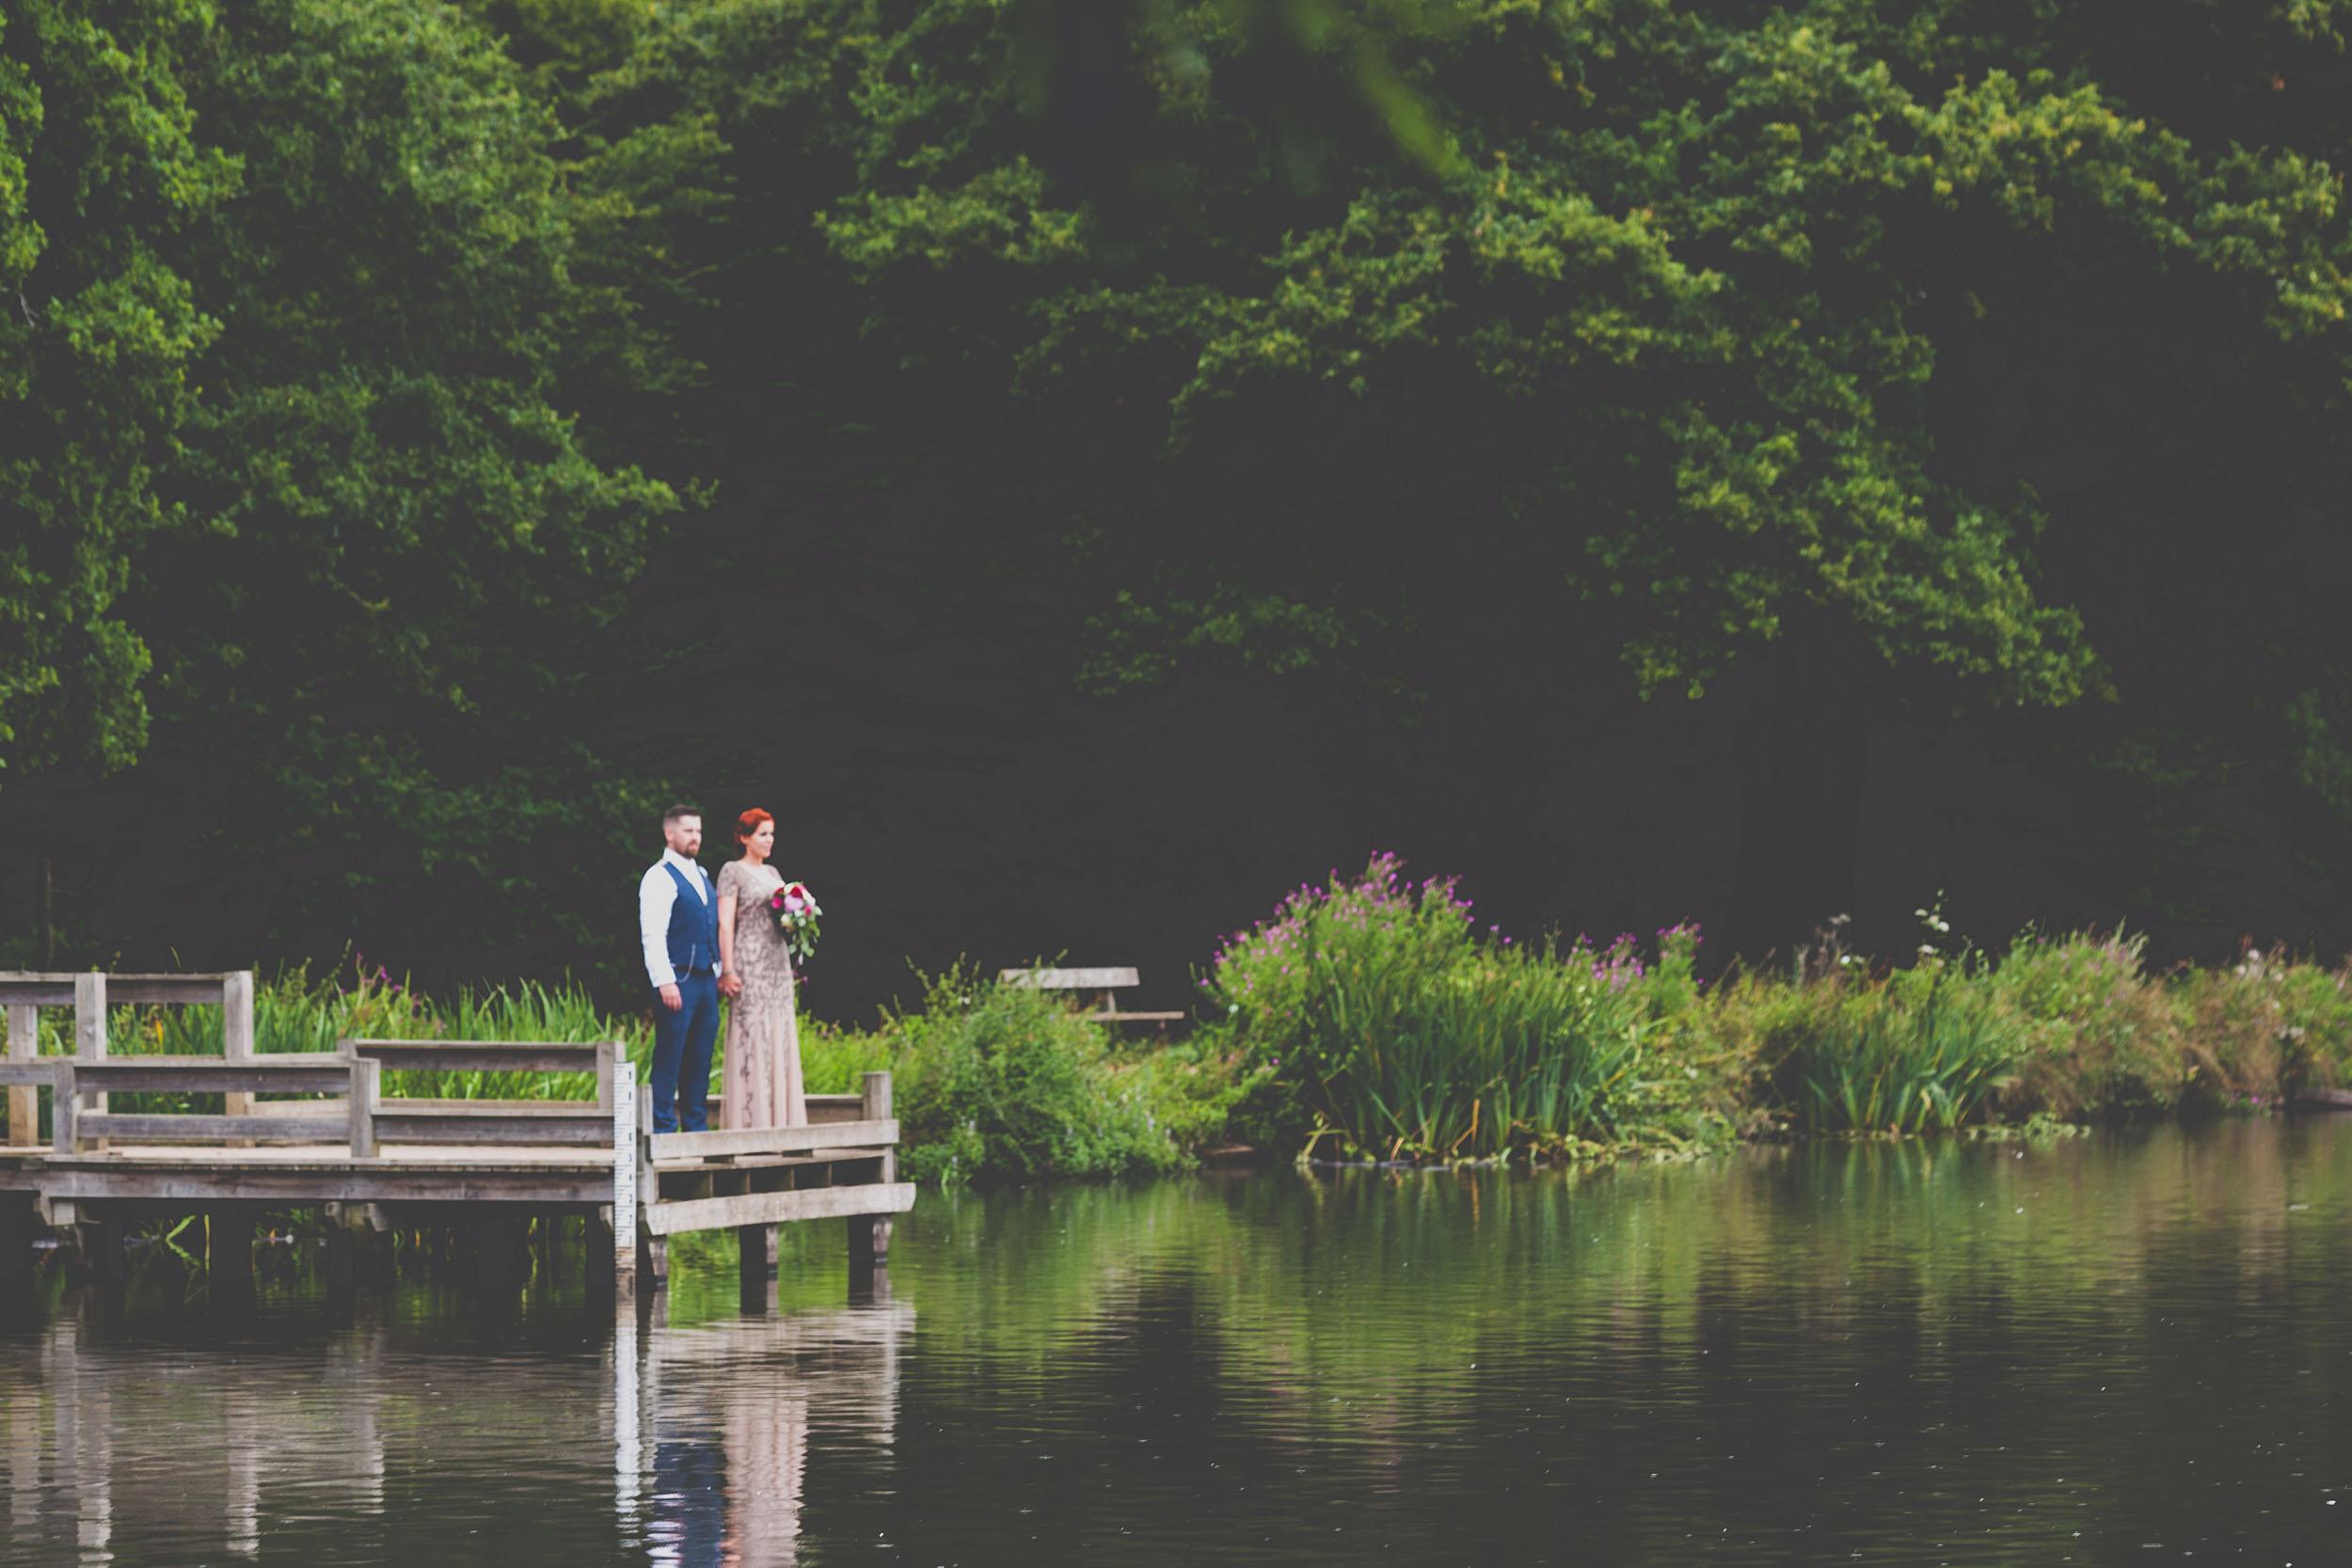 queen-elizabeths-hunting-lodge-epping-forest-wedding269.jpg